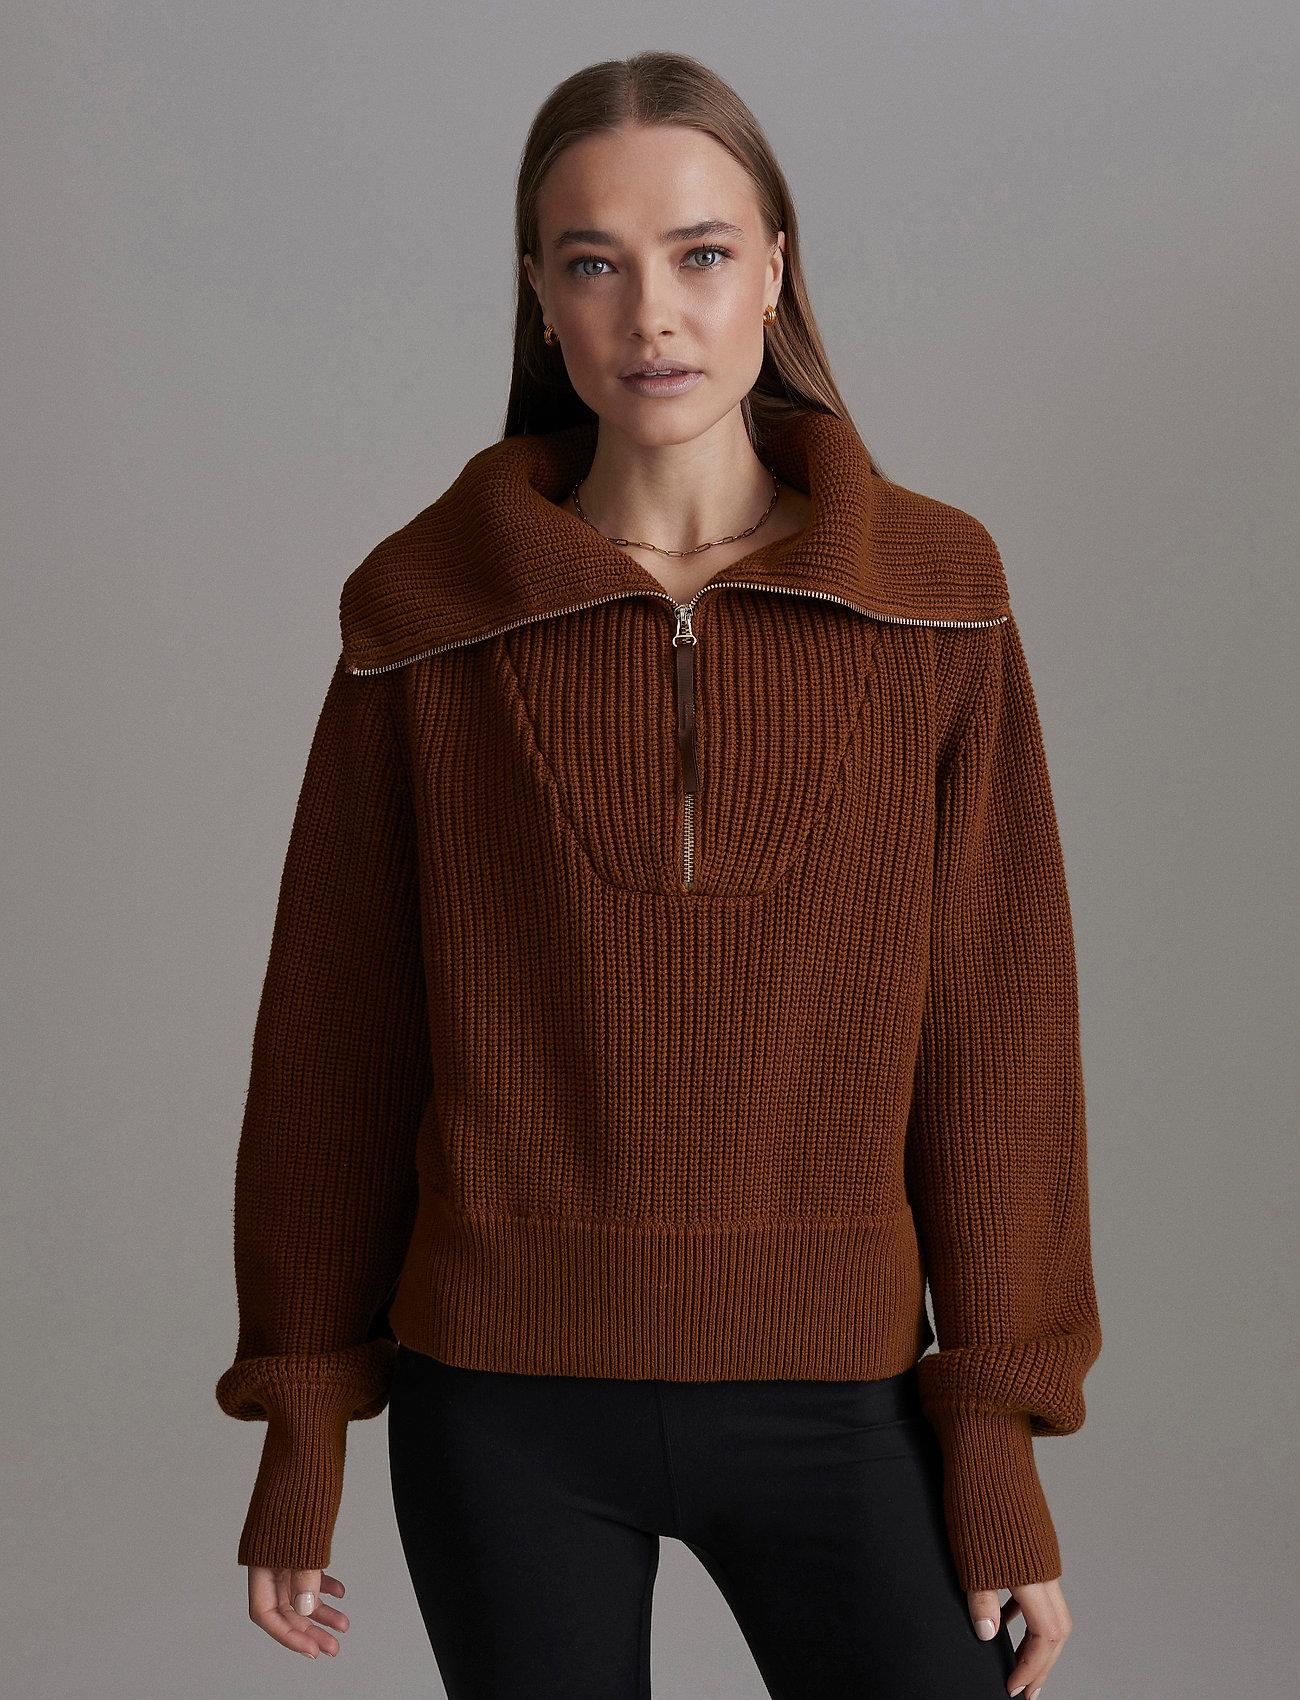 Varley - Mentone Top - turtlenecks - monks robe - 0